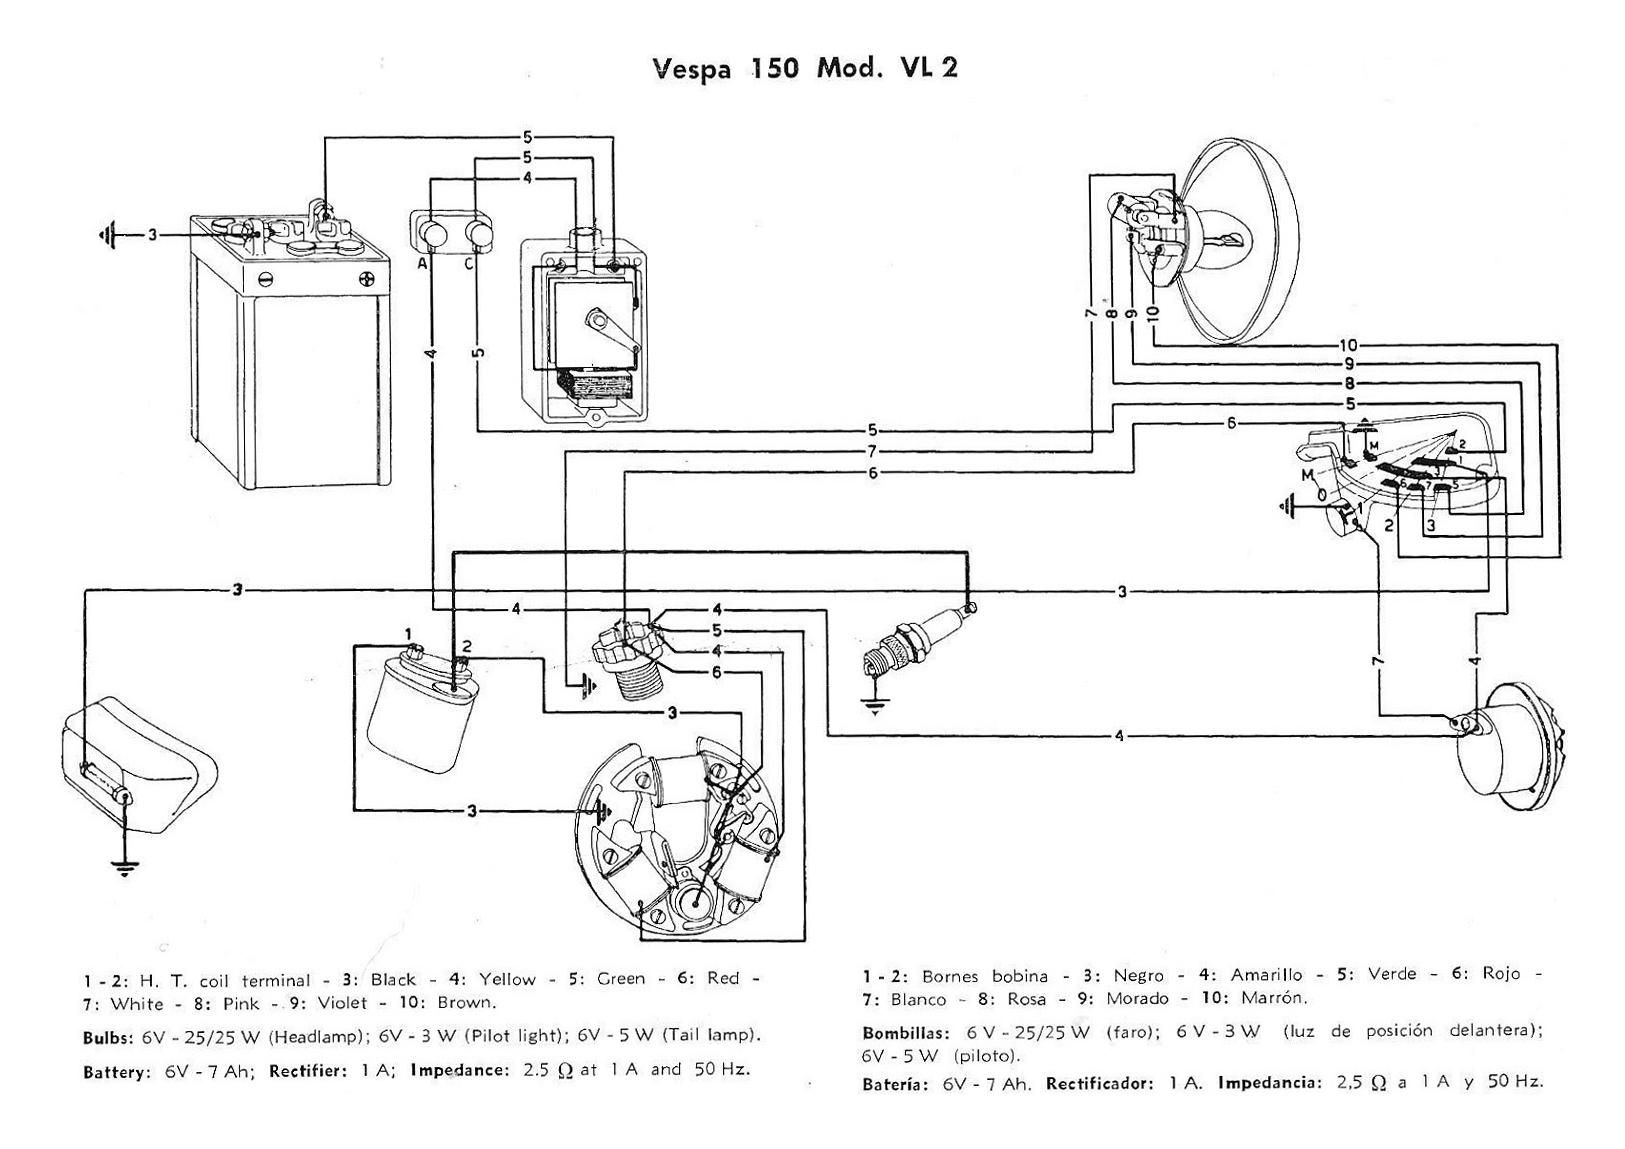 Schaltplan Vespa V50